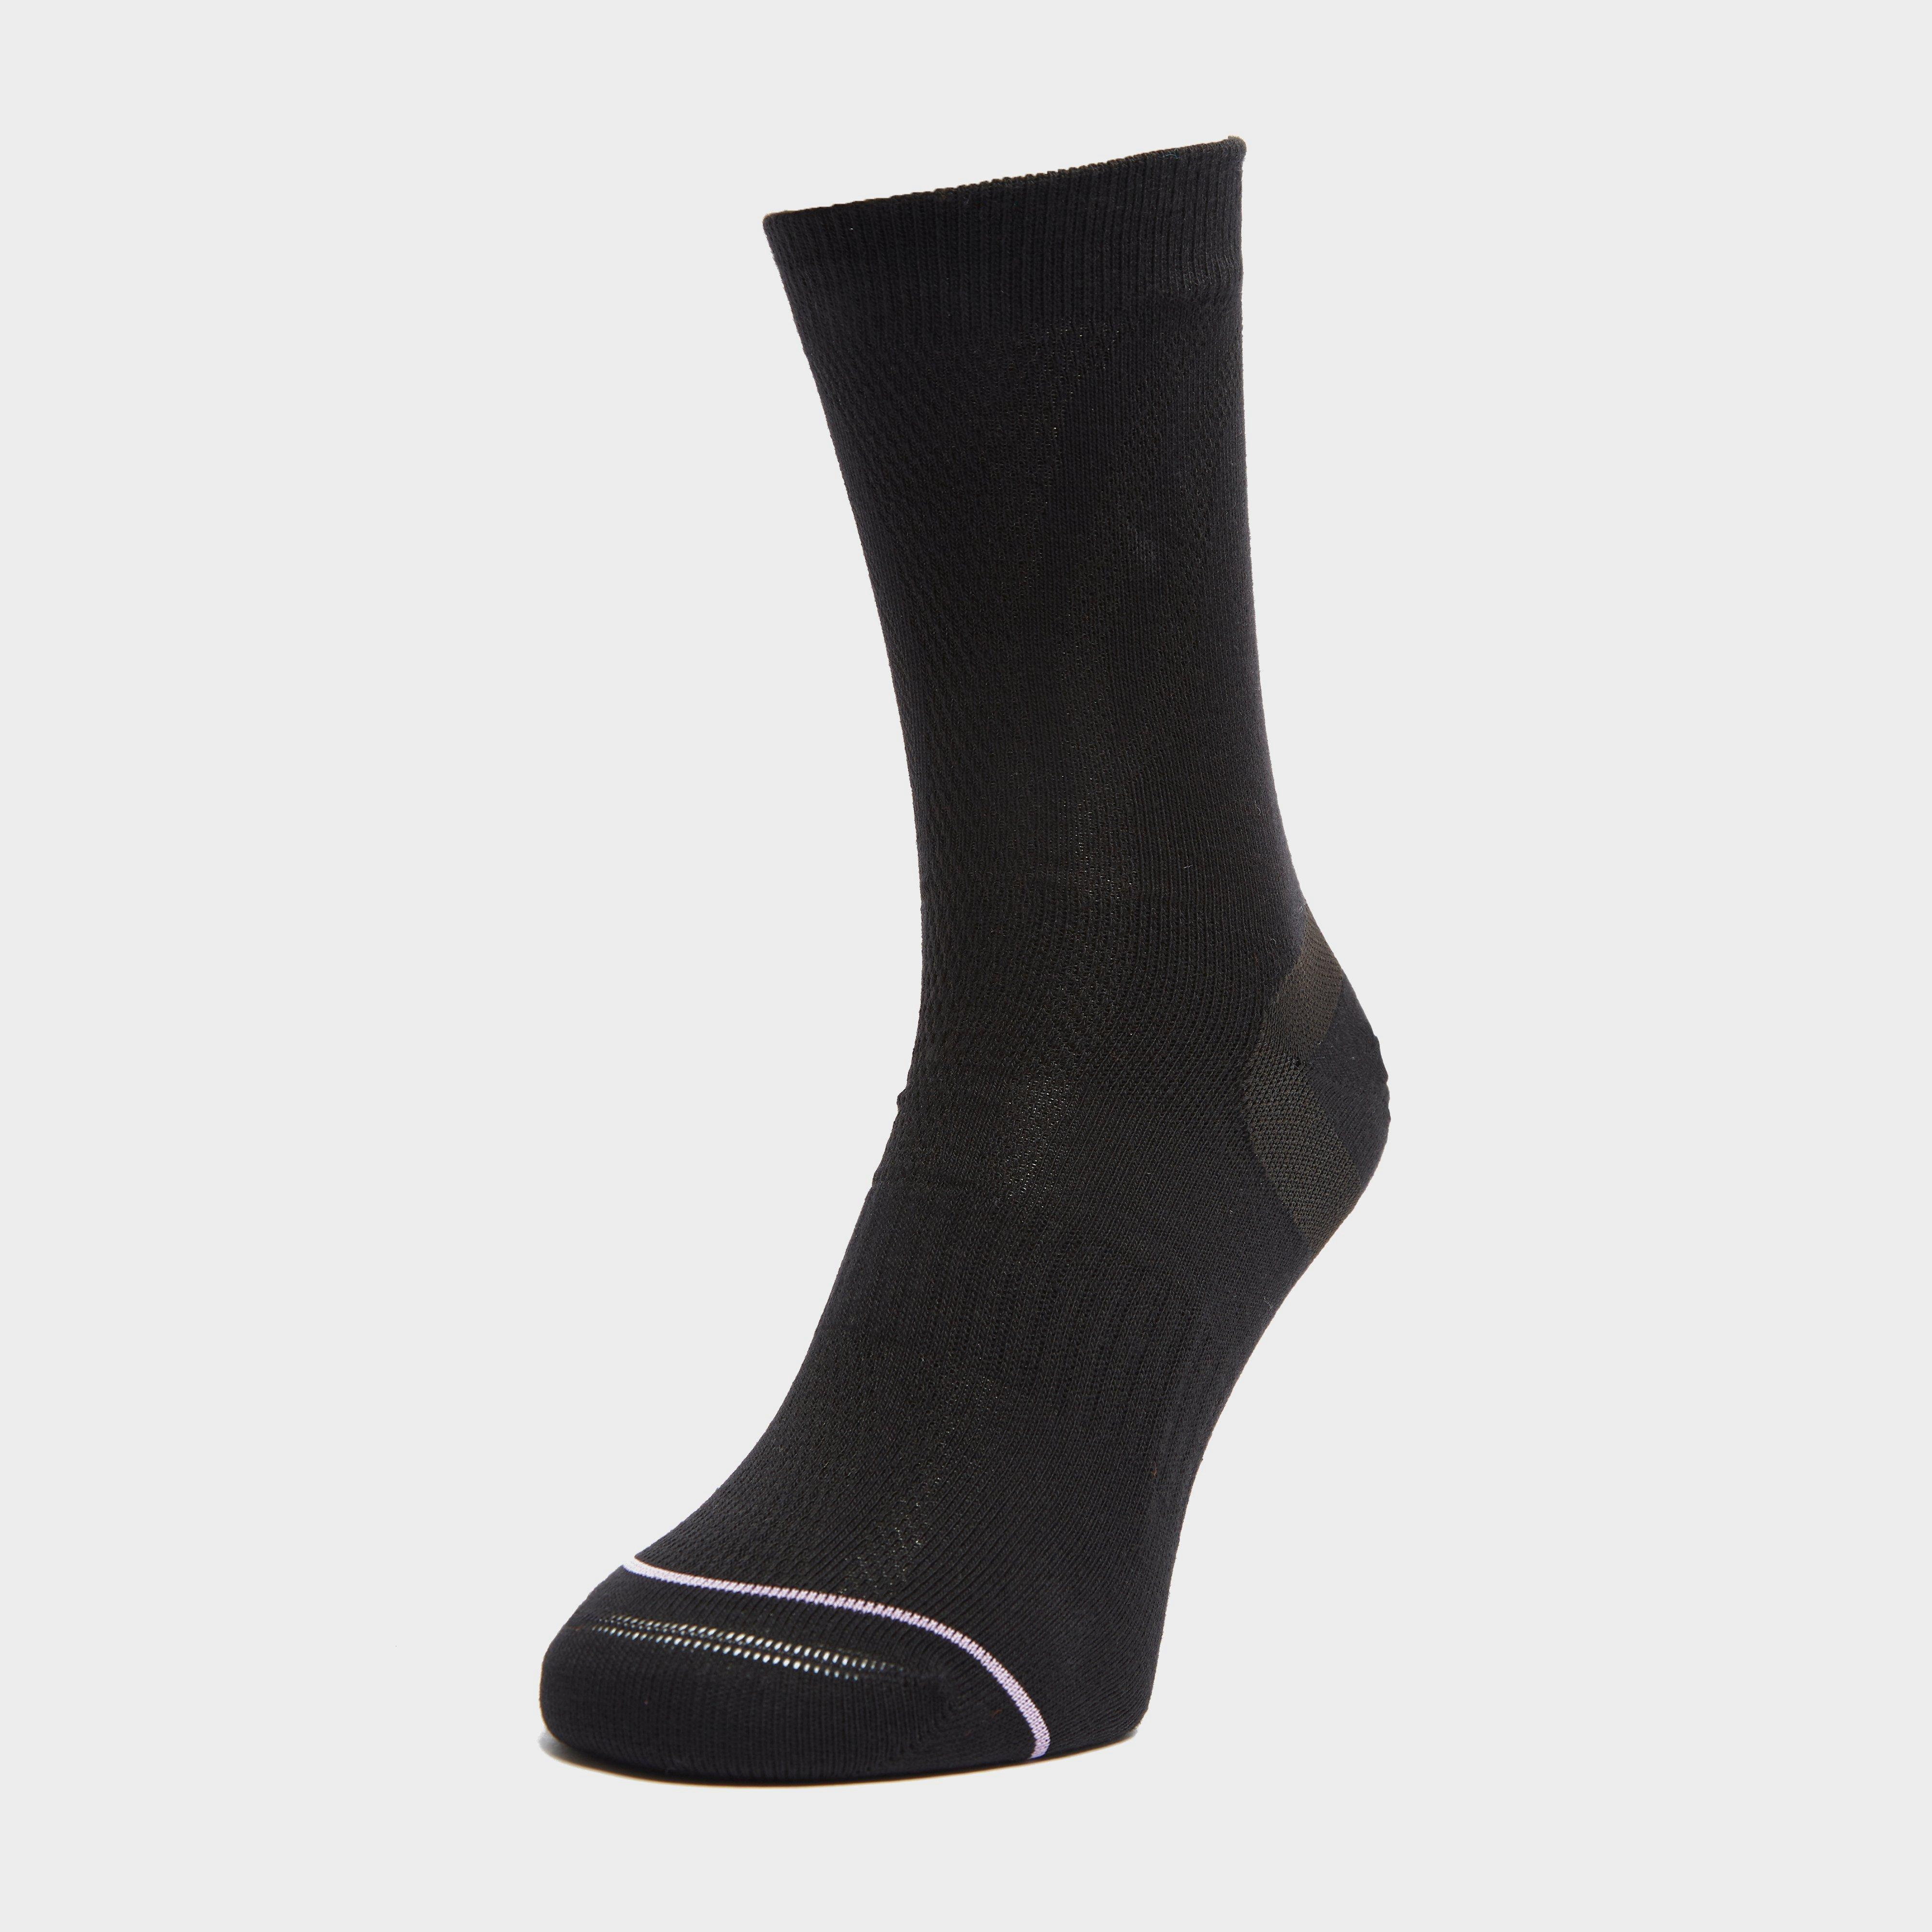 1000 Mile Tactel Ultimate Liner Socks - Black/black  Black/black